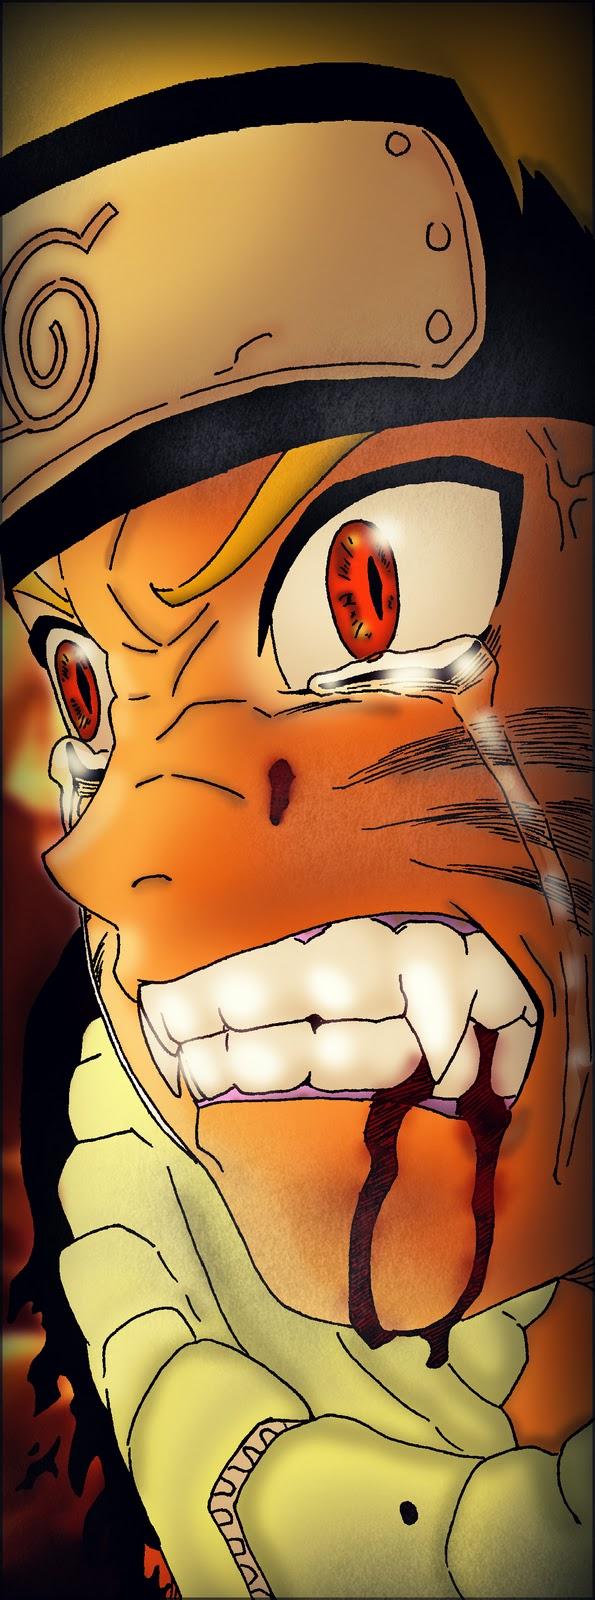 Naruto coloreado con Photoshop  Distrito Bore